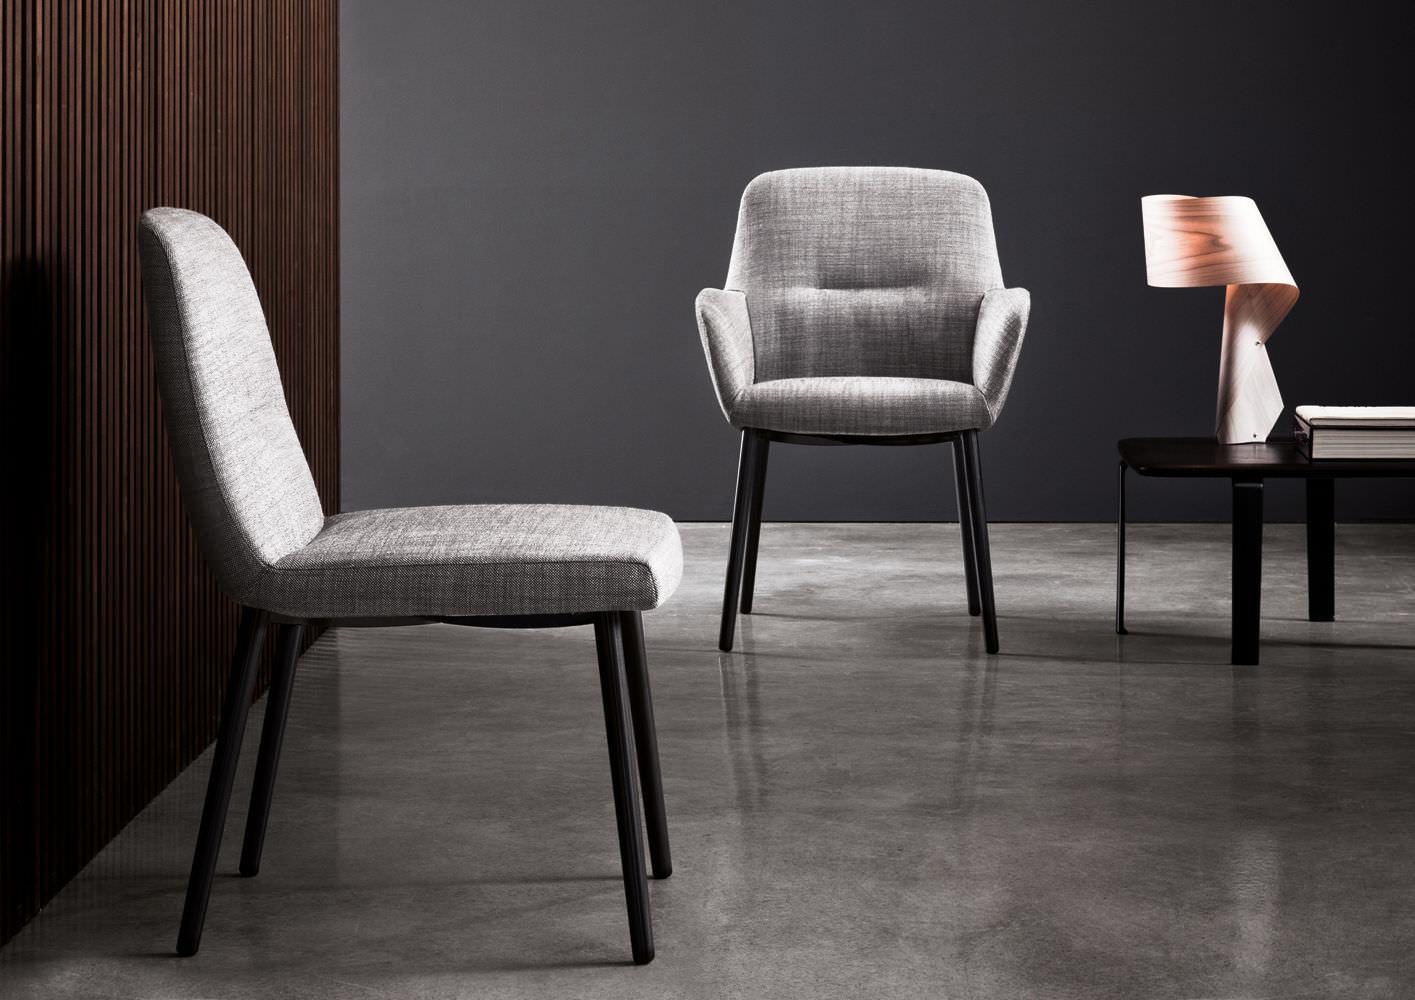 ... Contemporary Chair / Upholstered / Ergonomic / Fabric FLAVIN Minotti